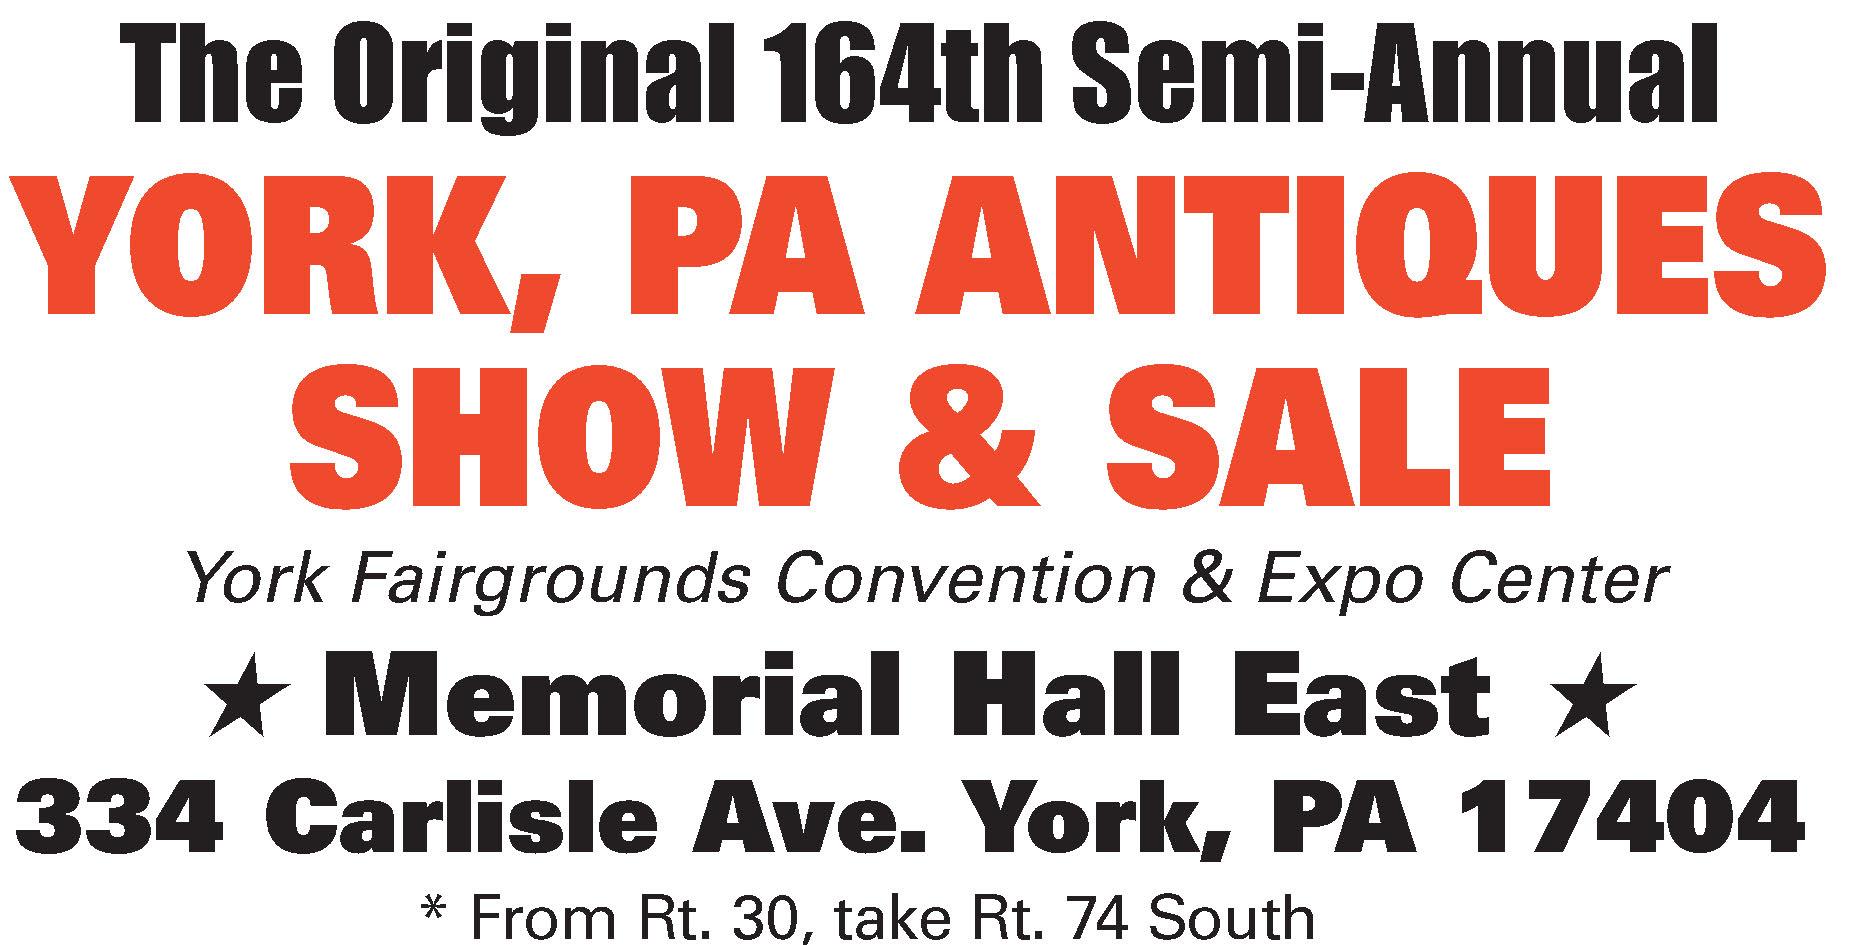 The Original 164th Semi-Annual York, PA Antiques Show & Sale